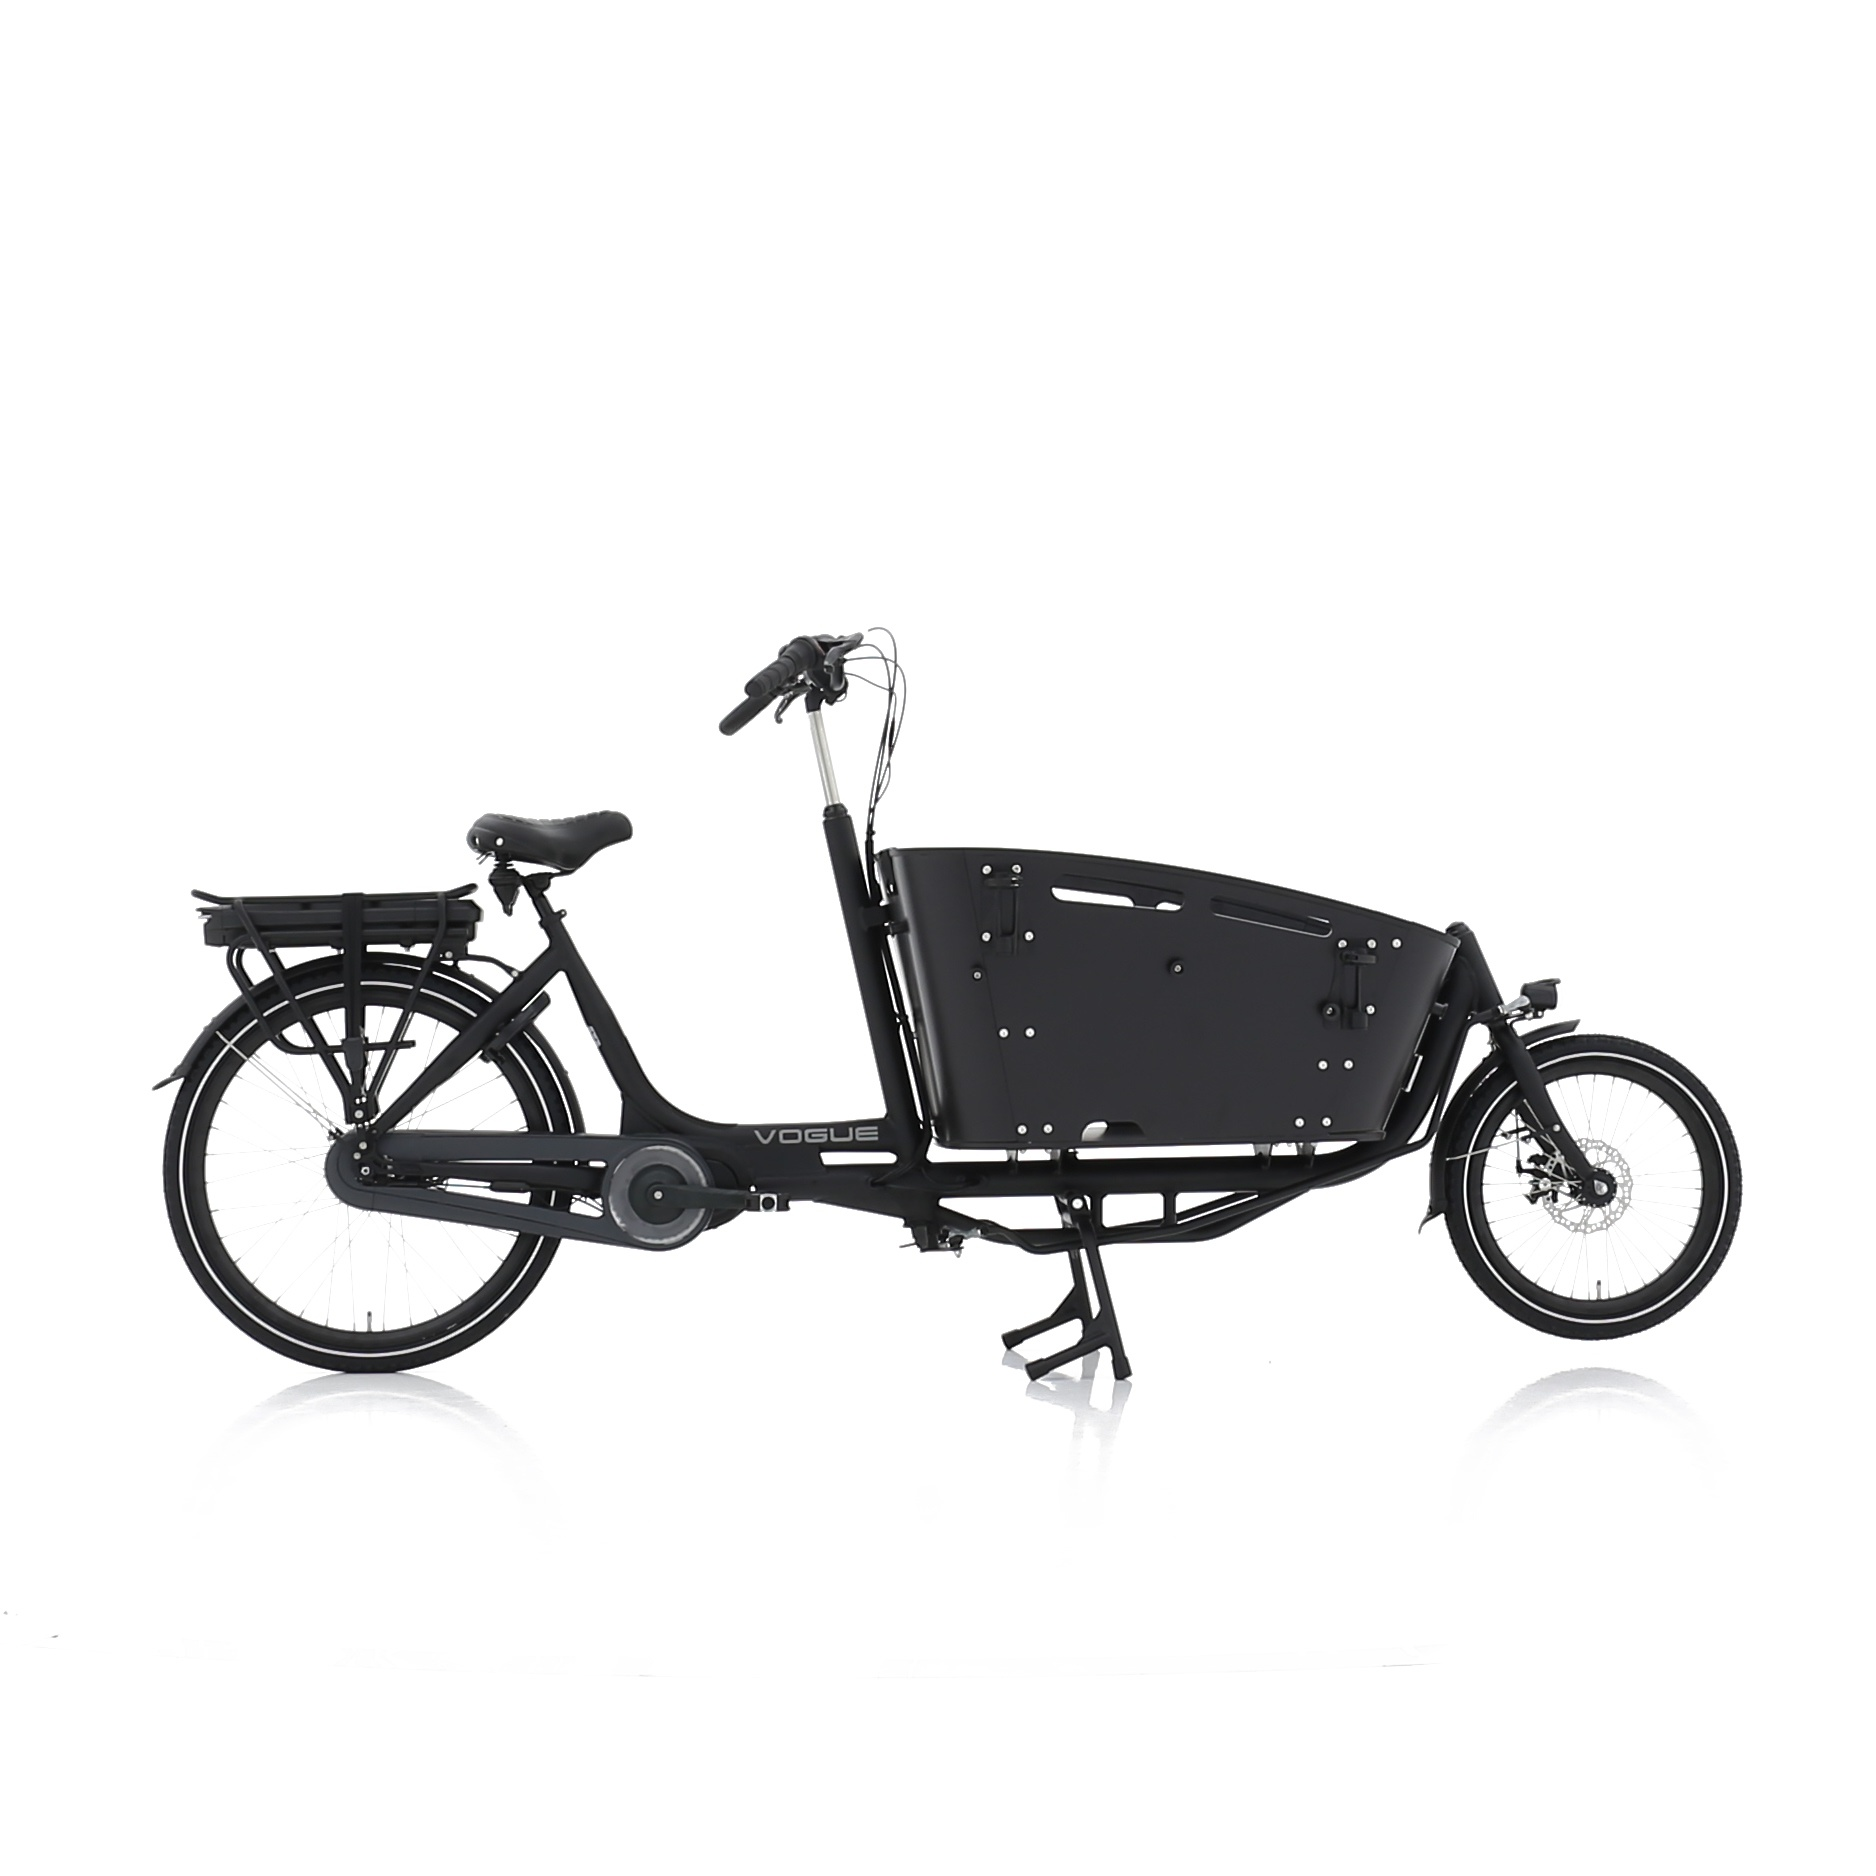 Vogue Carry 2 Bakfiets 48cm Matt Black/Black 7V